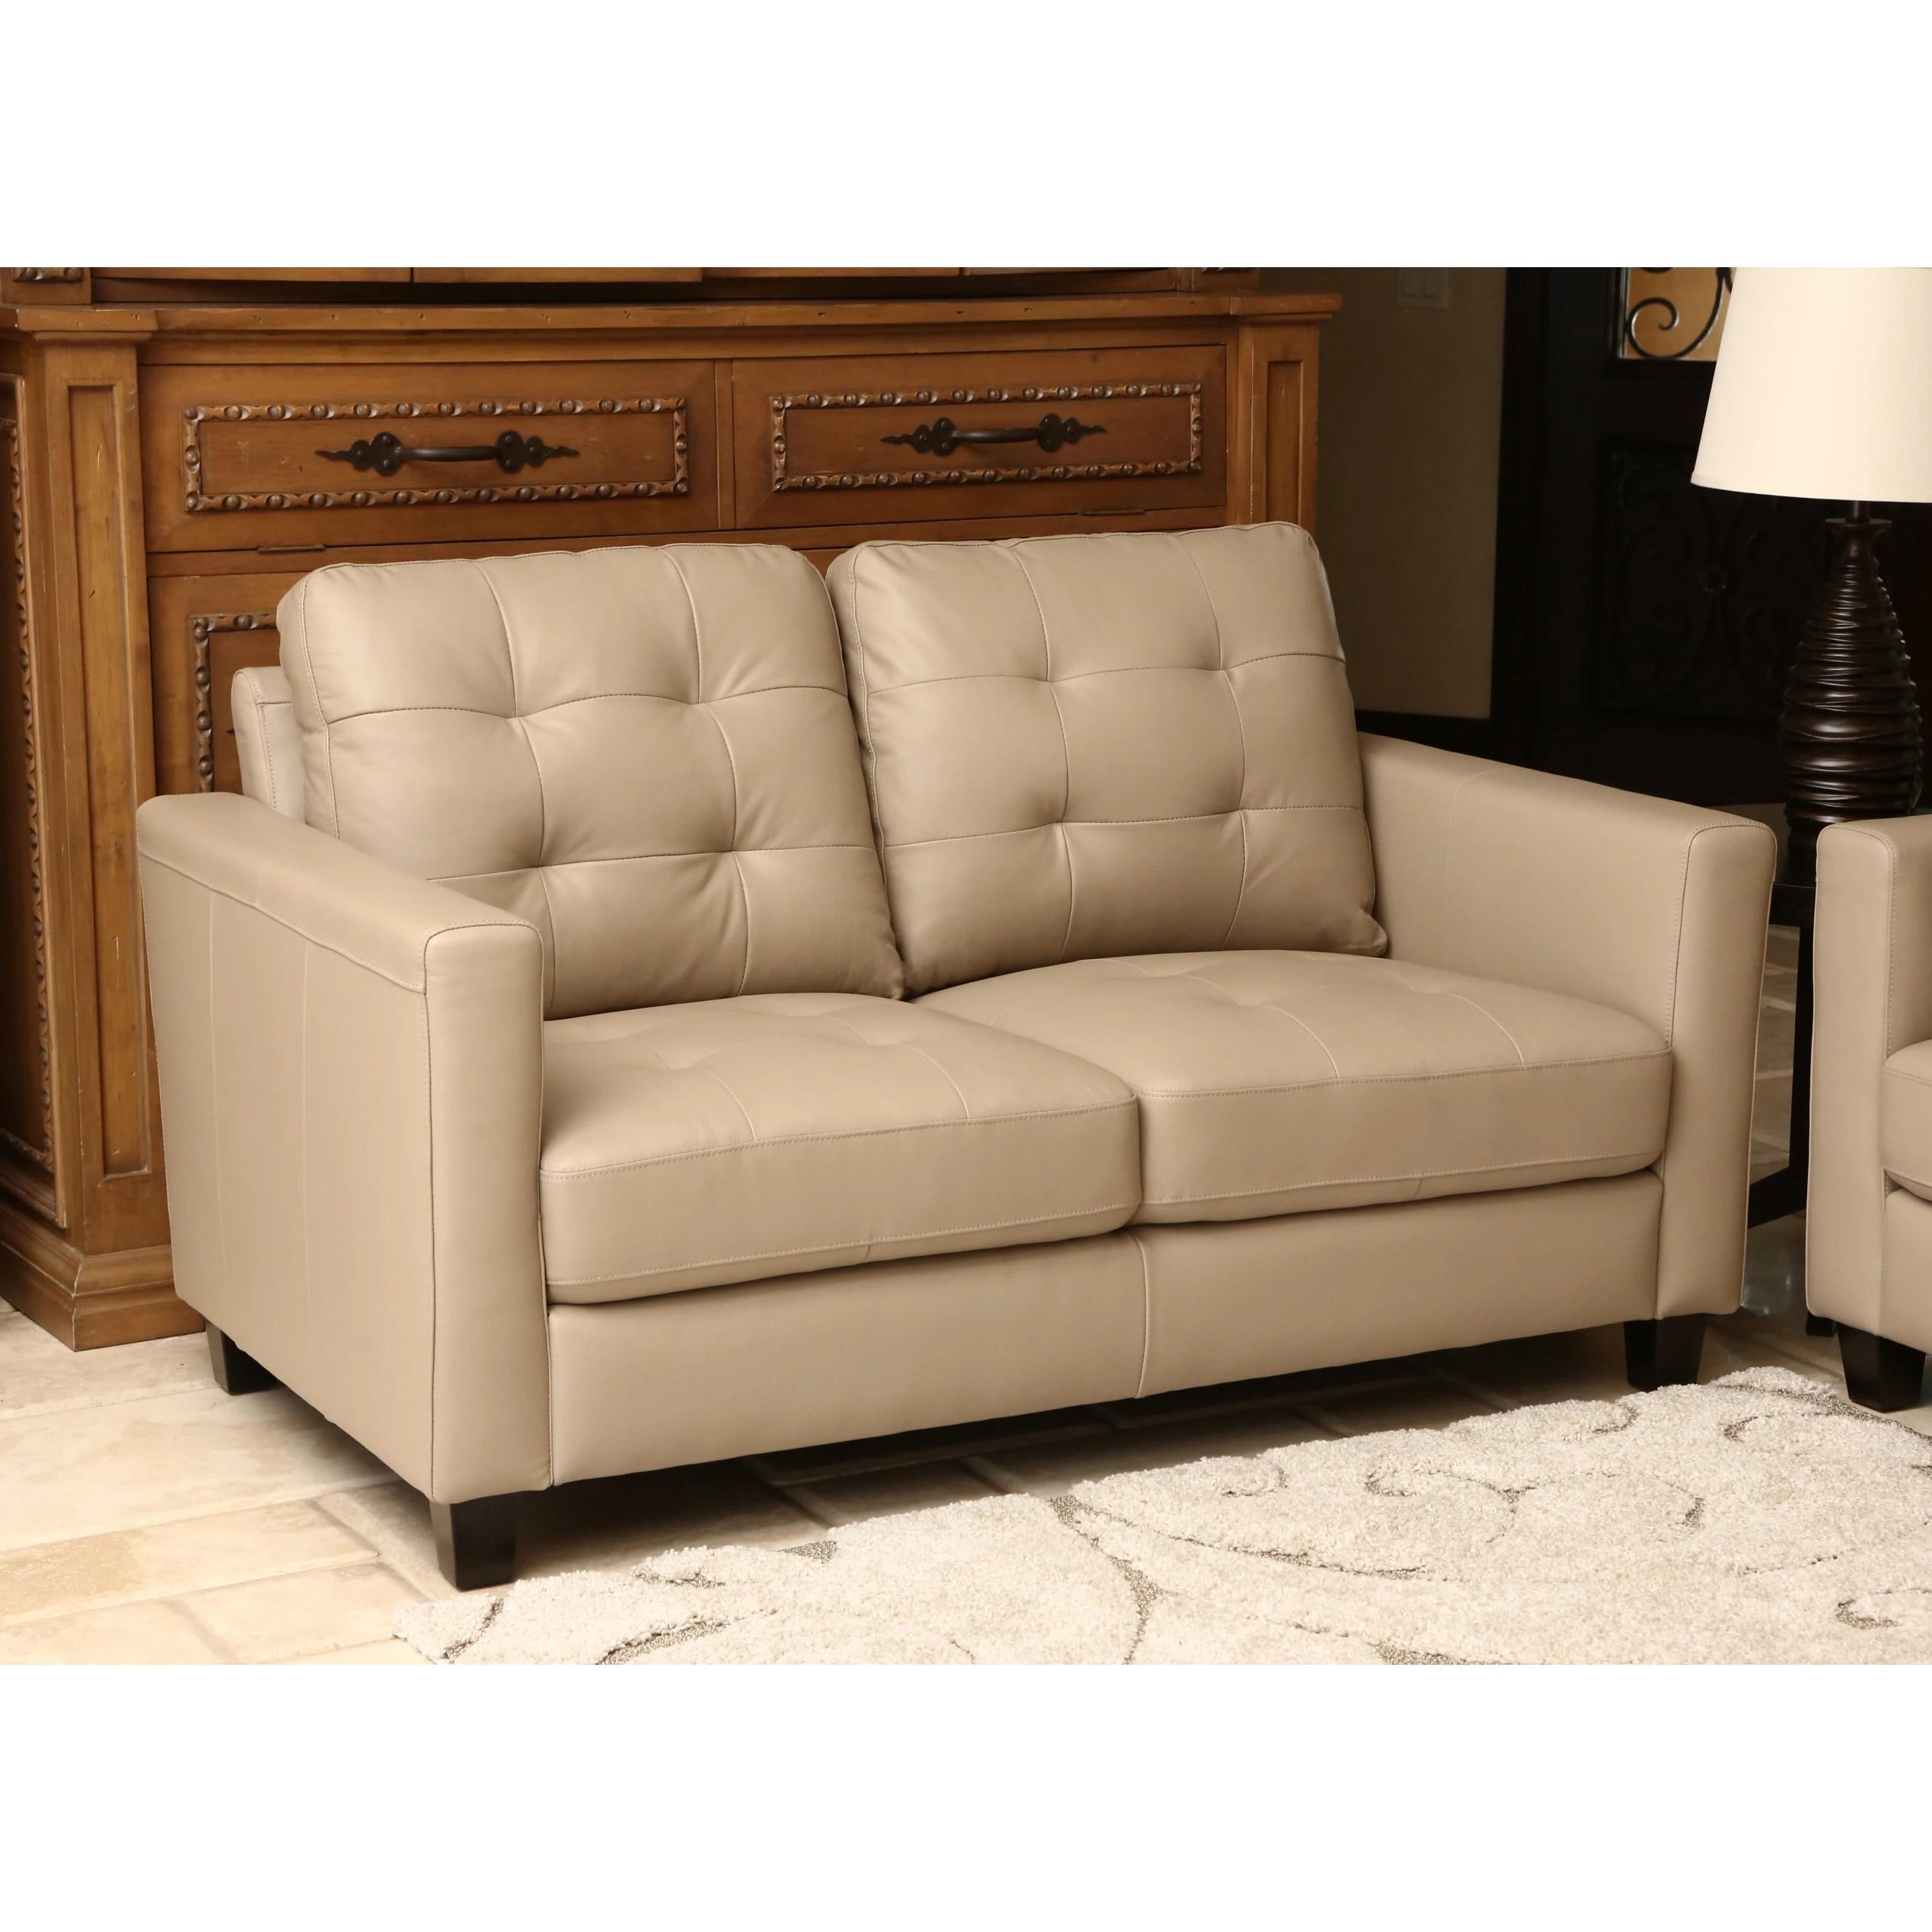 leona sofa bed thomasville furniture fabric sofas range review home co